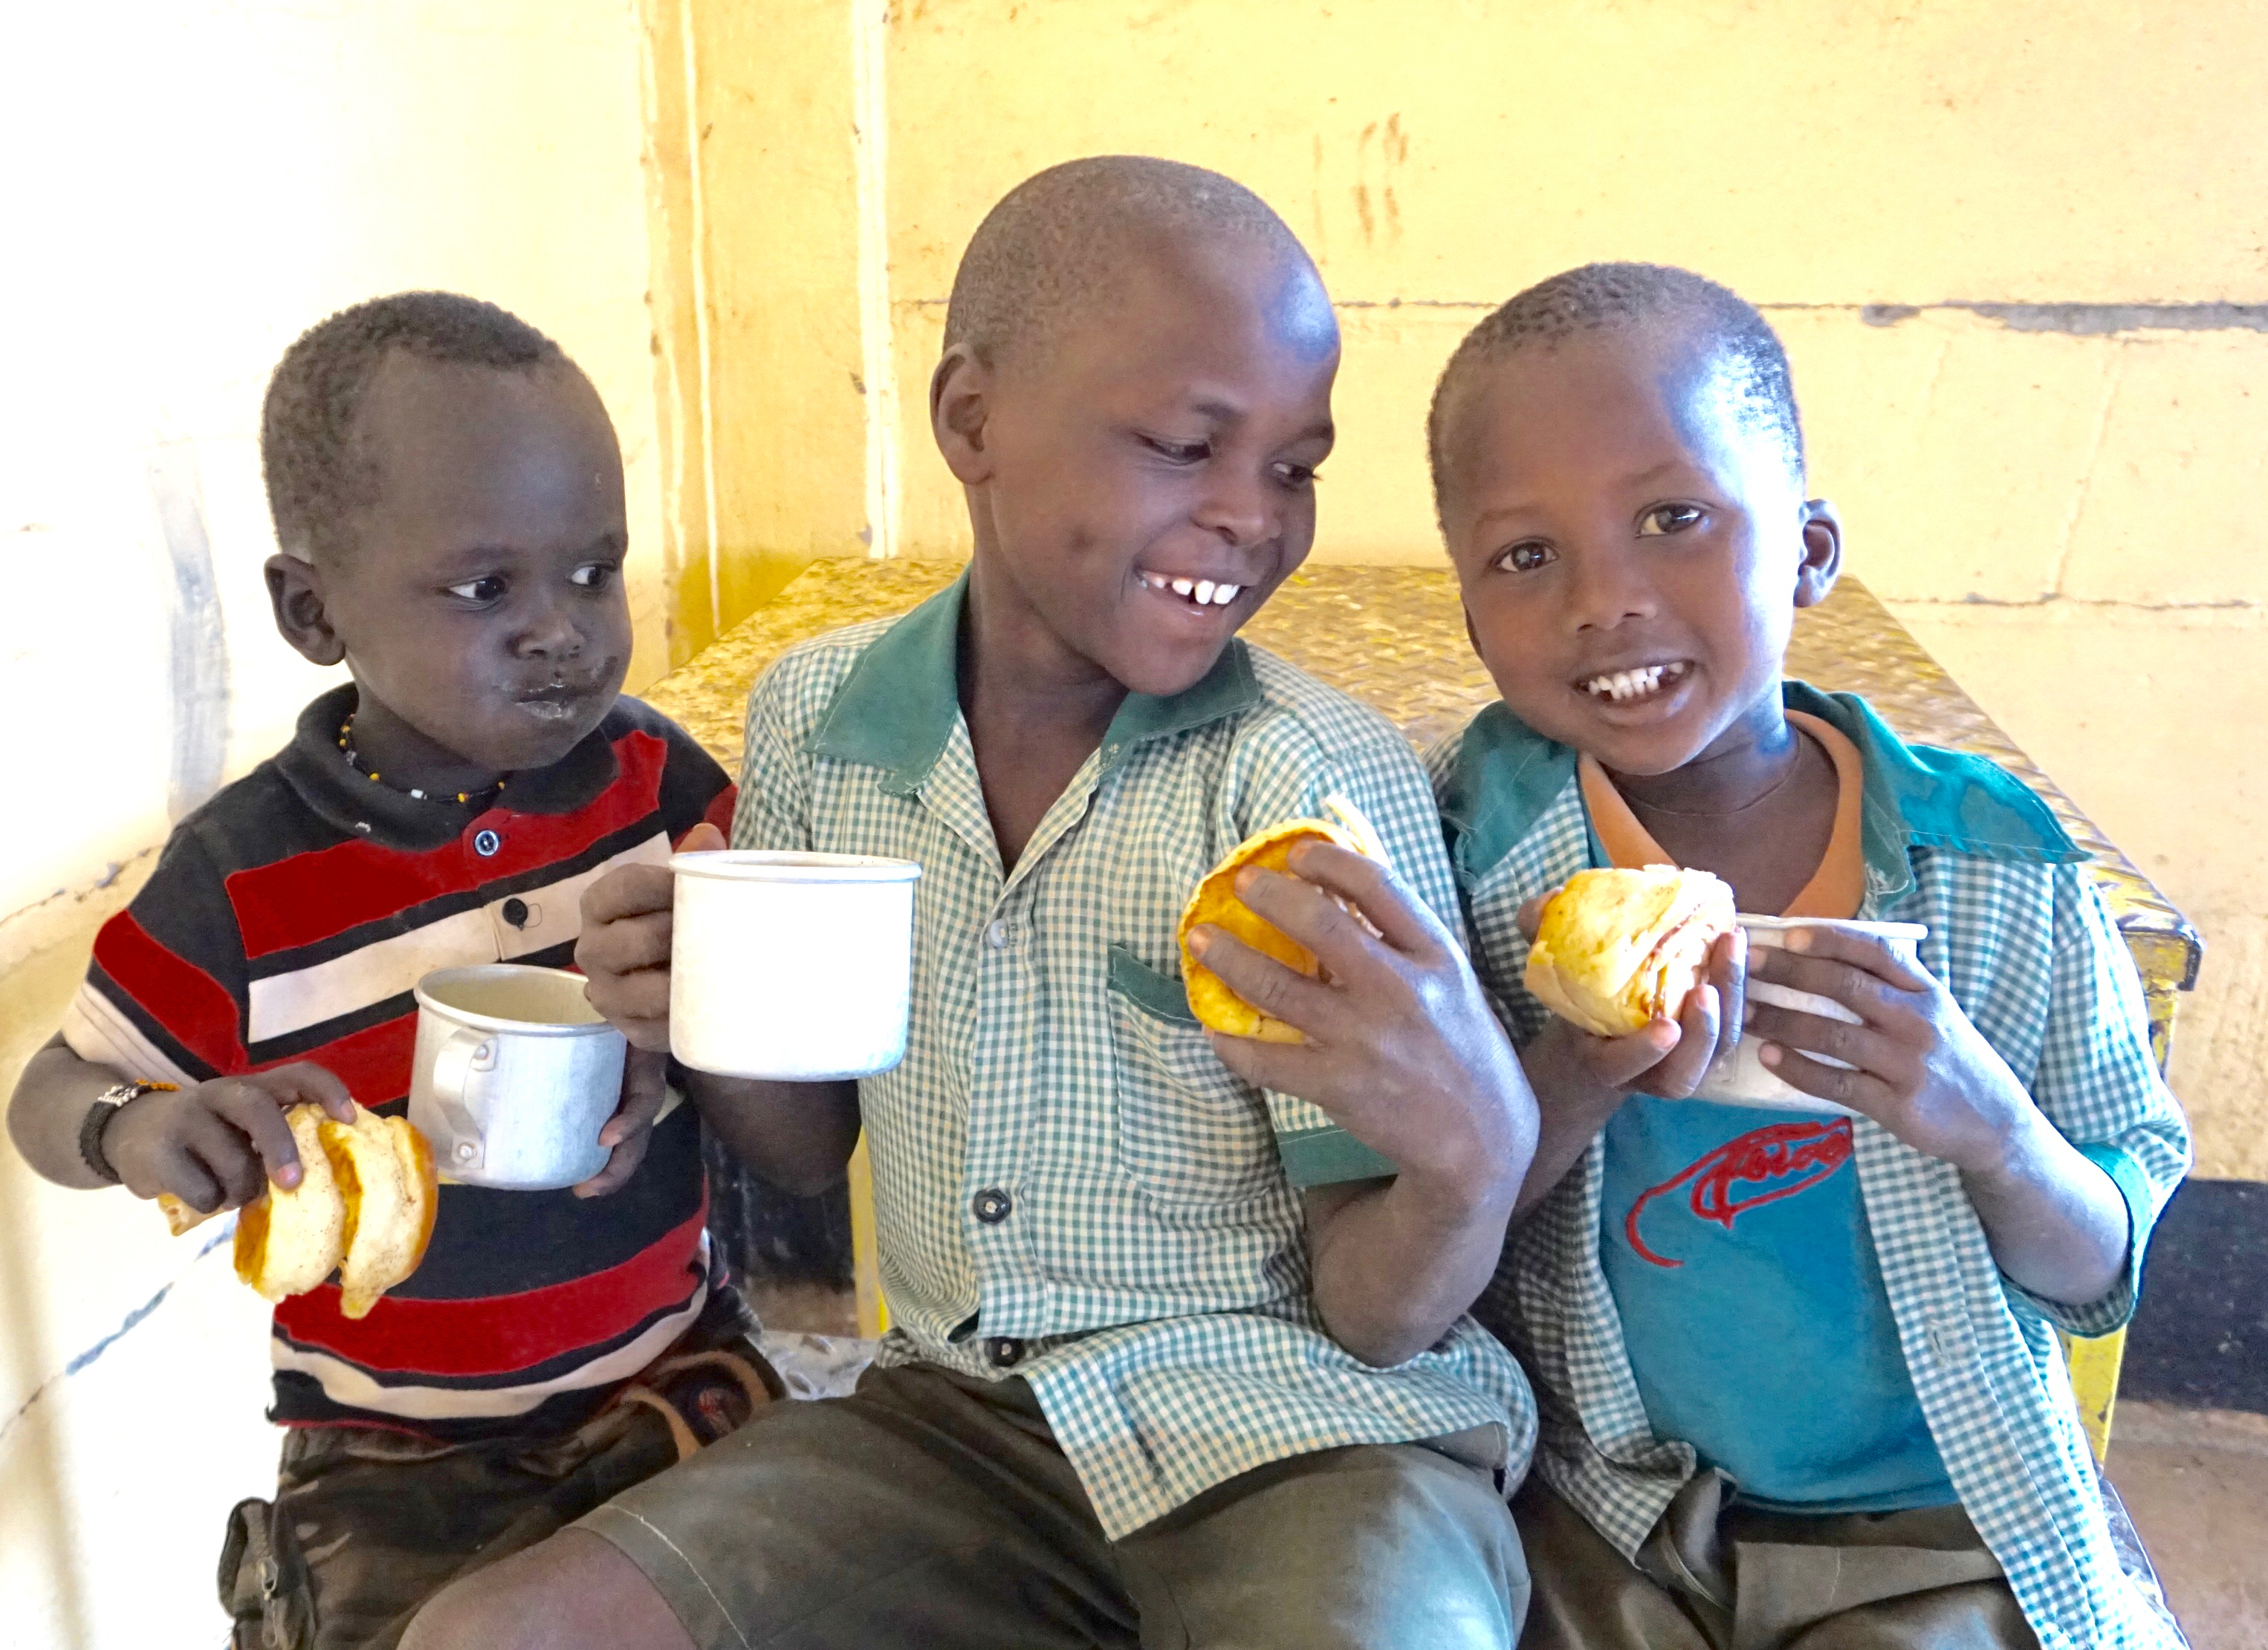 Sverige/Kenya: Ett stort kalas